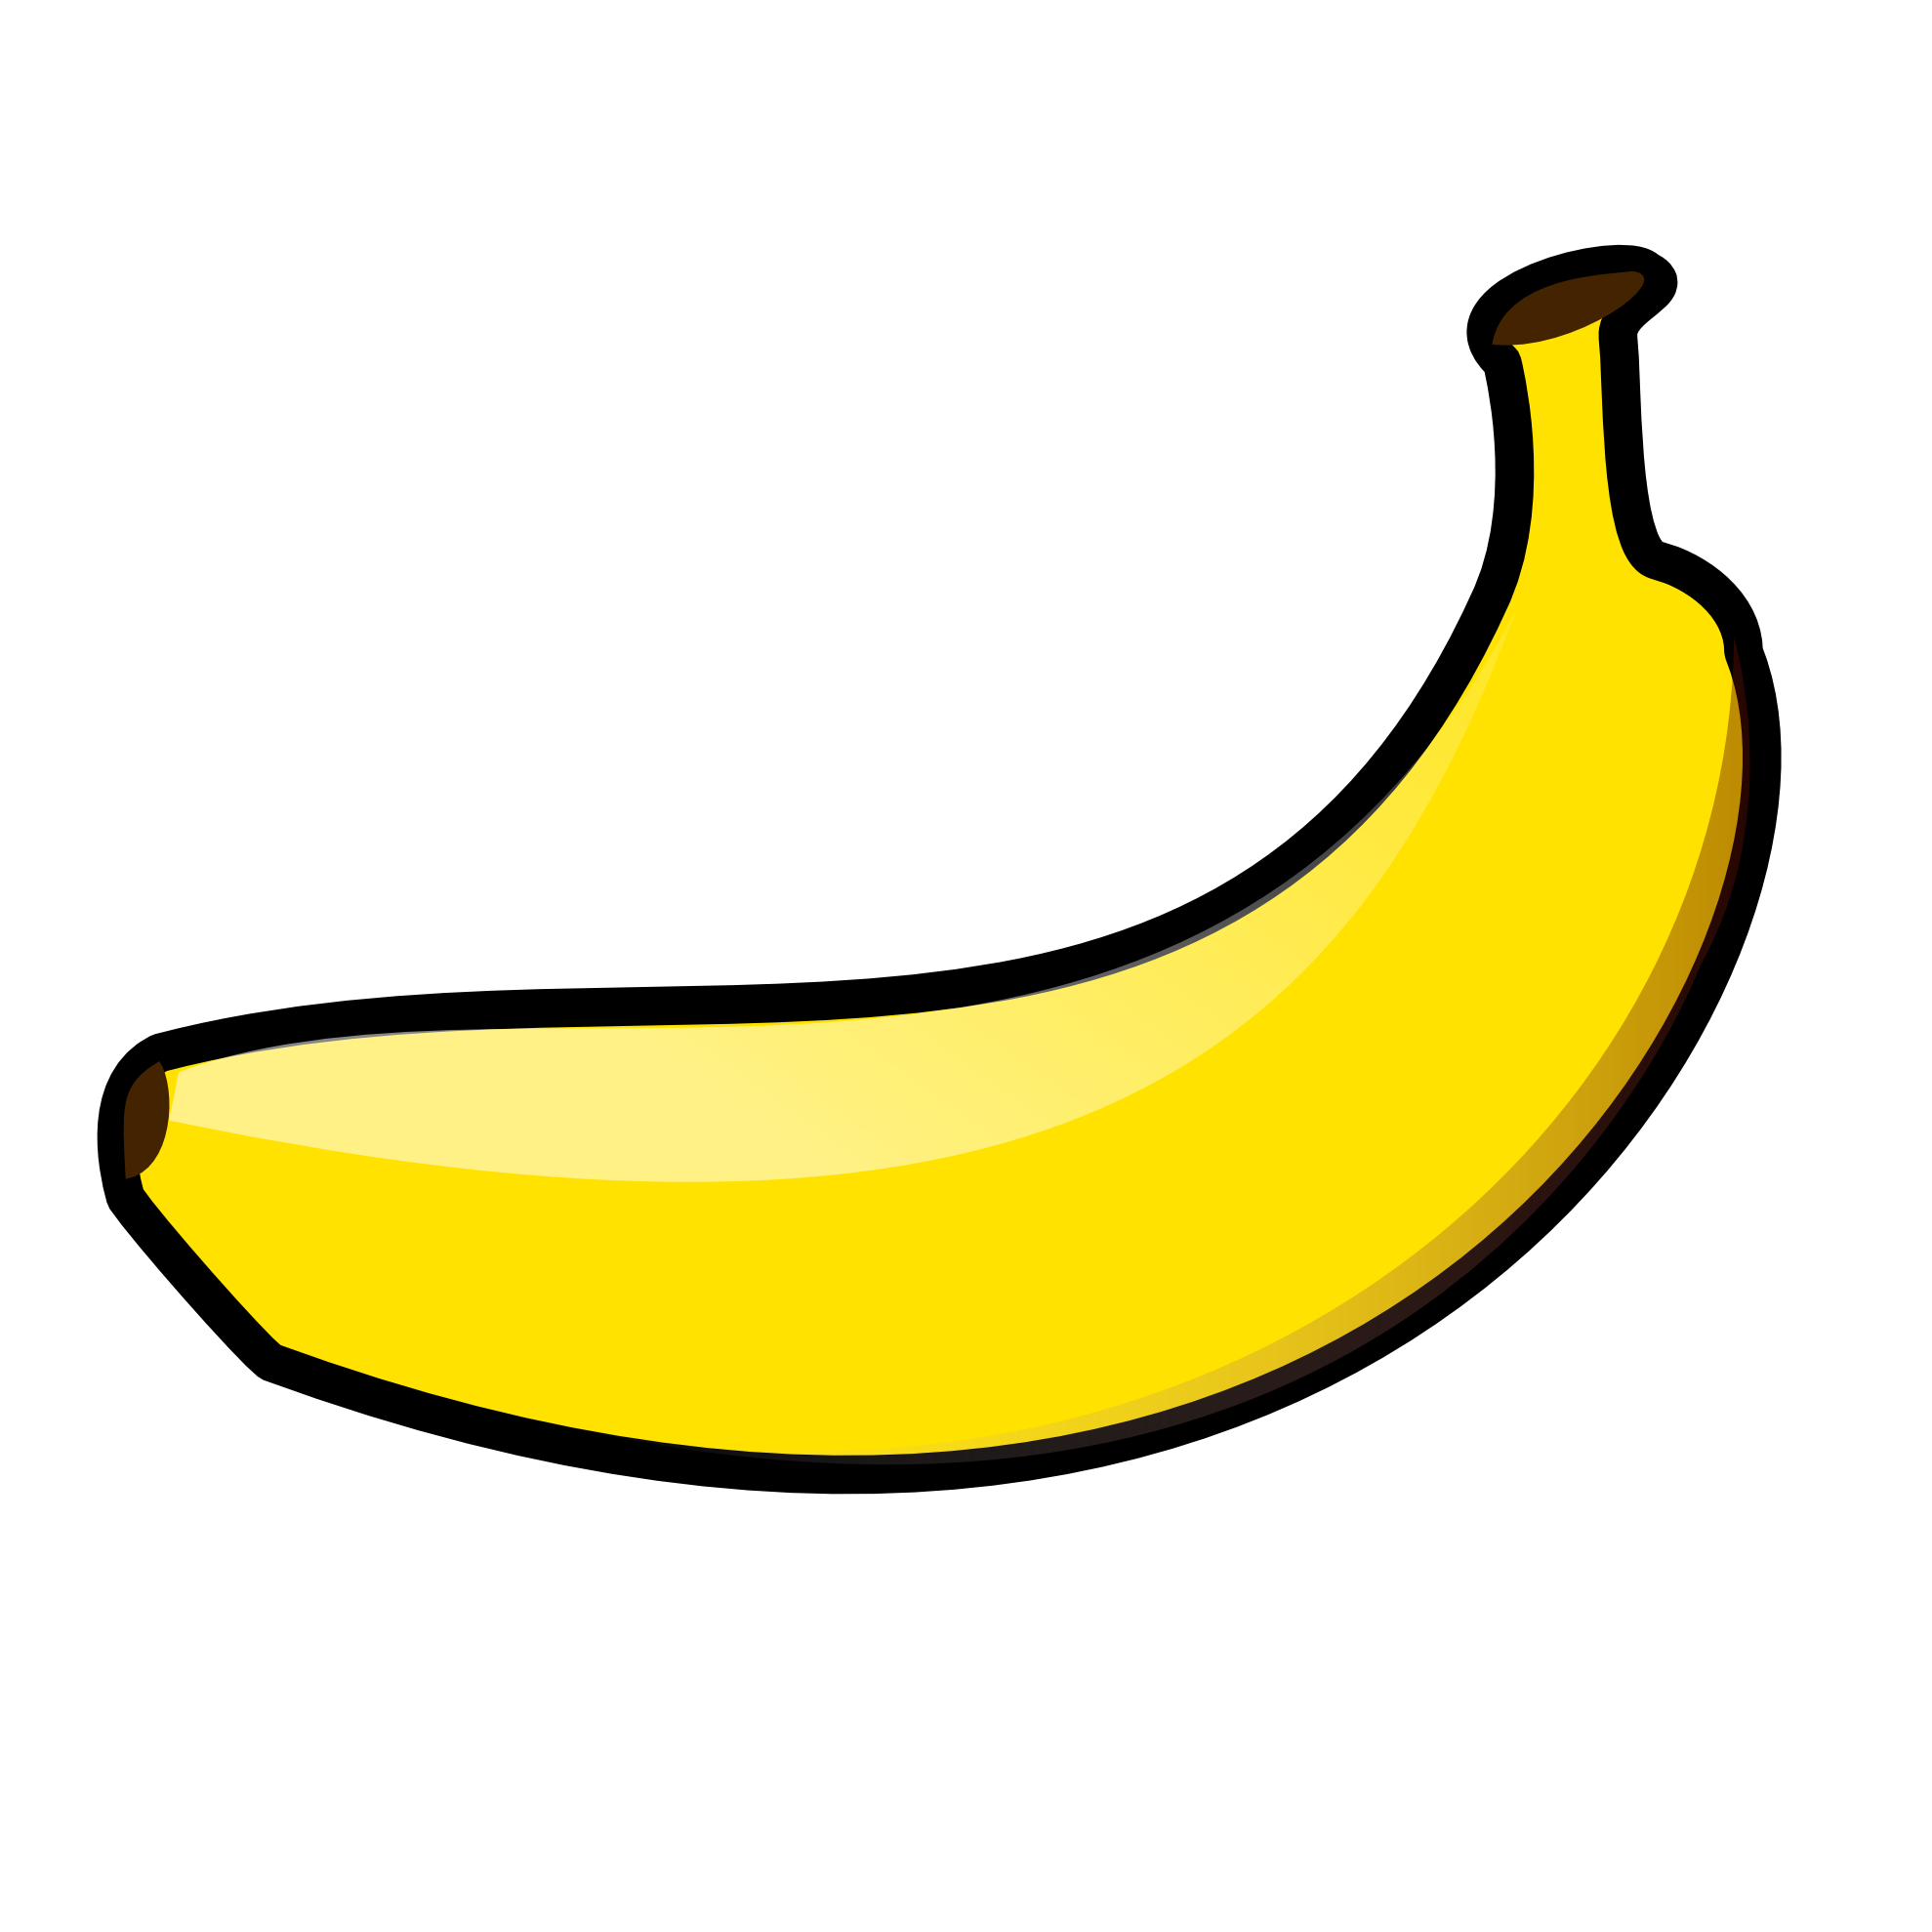 Banana Clipart Black And Educationplay Pinterest Blanco Y Negro